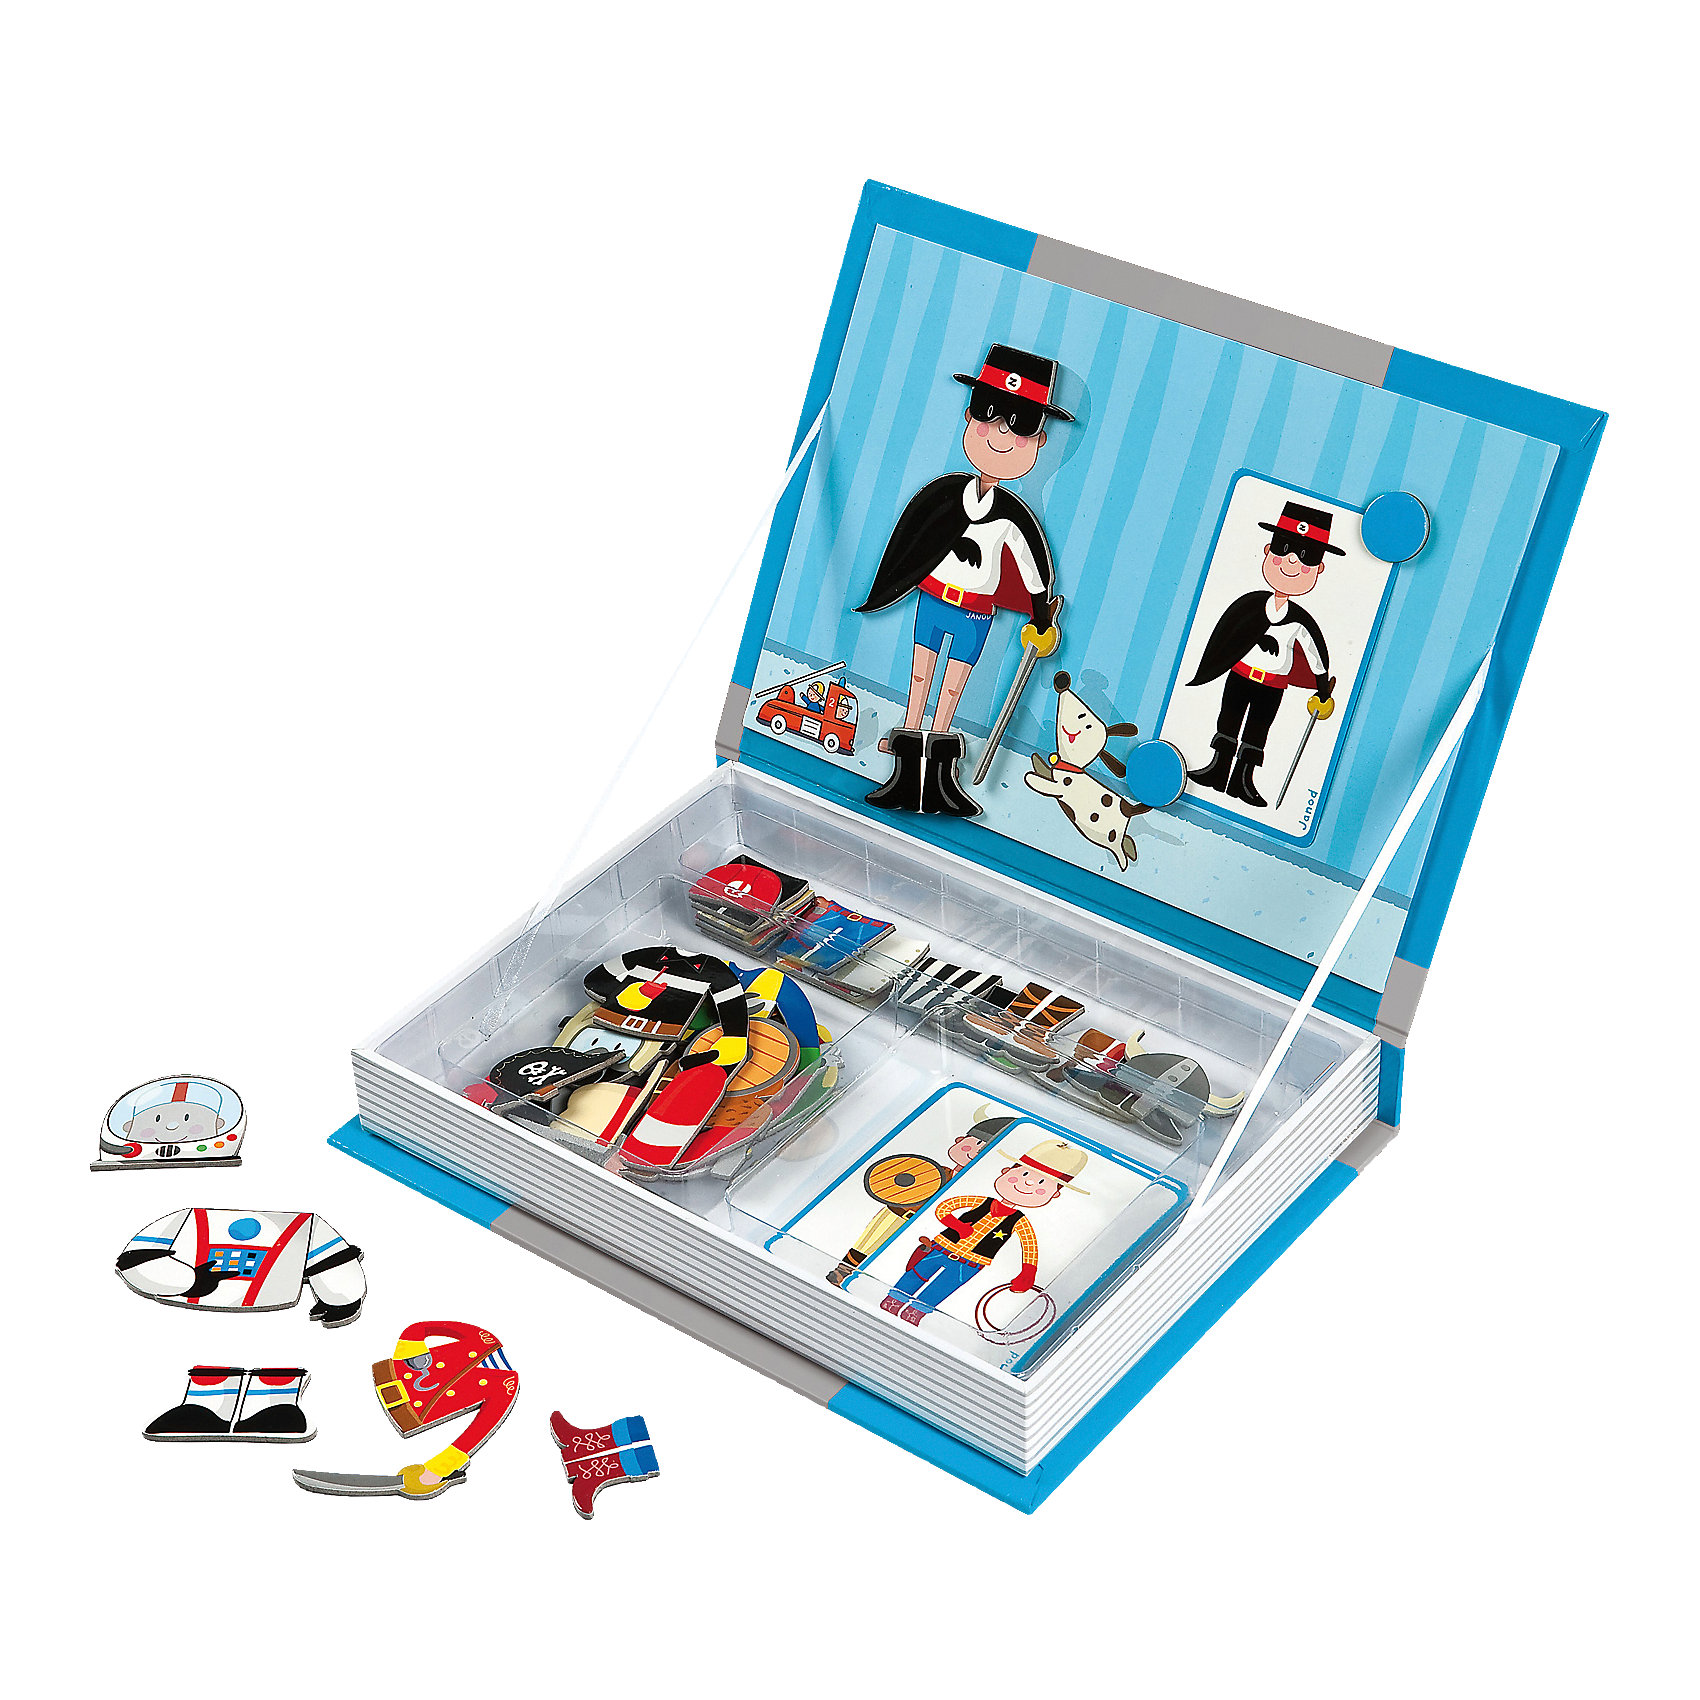 janod магнитная книга игра лошадки 24 магнита 8 моделей 4 пейзажа Janod Магнитная книга-игра Мальчишки в костюмах, Janod